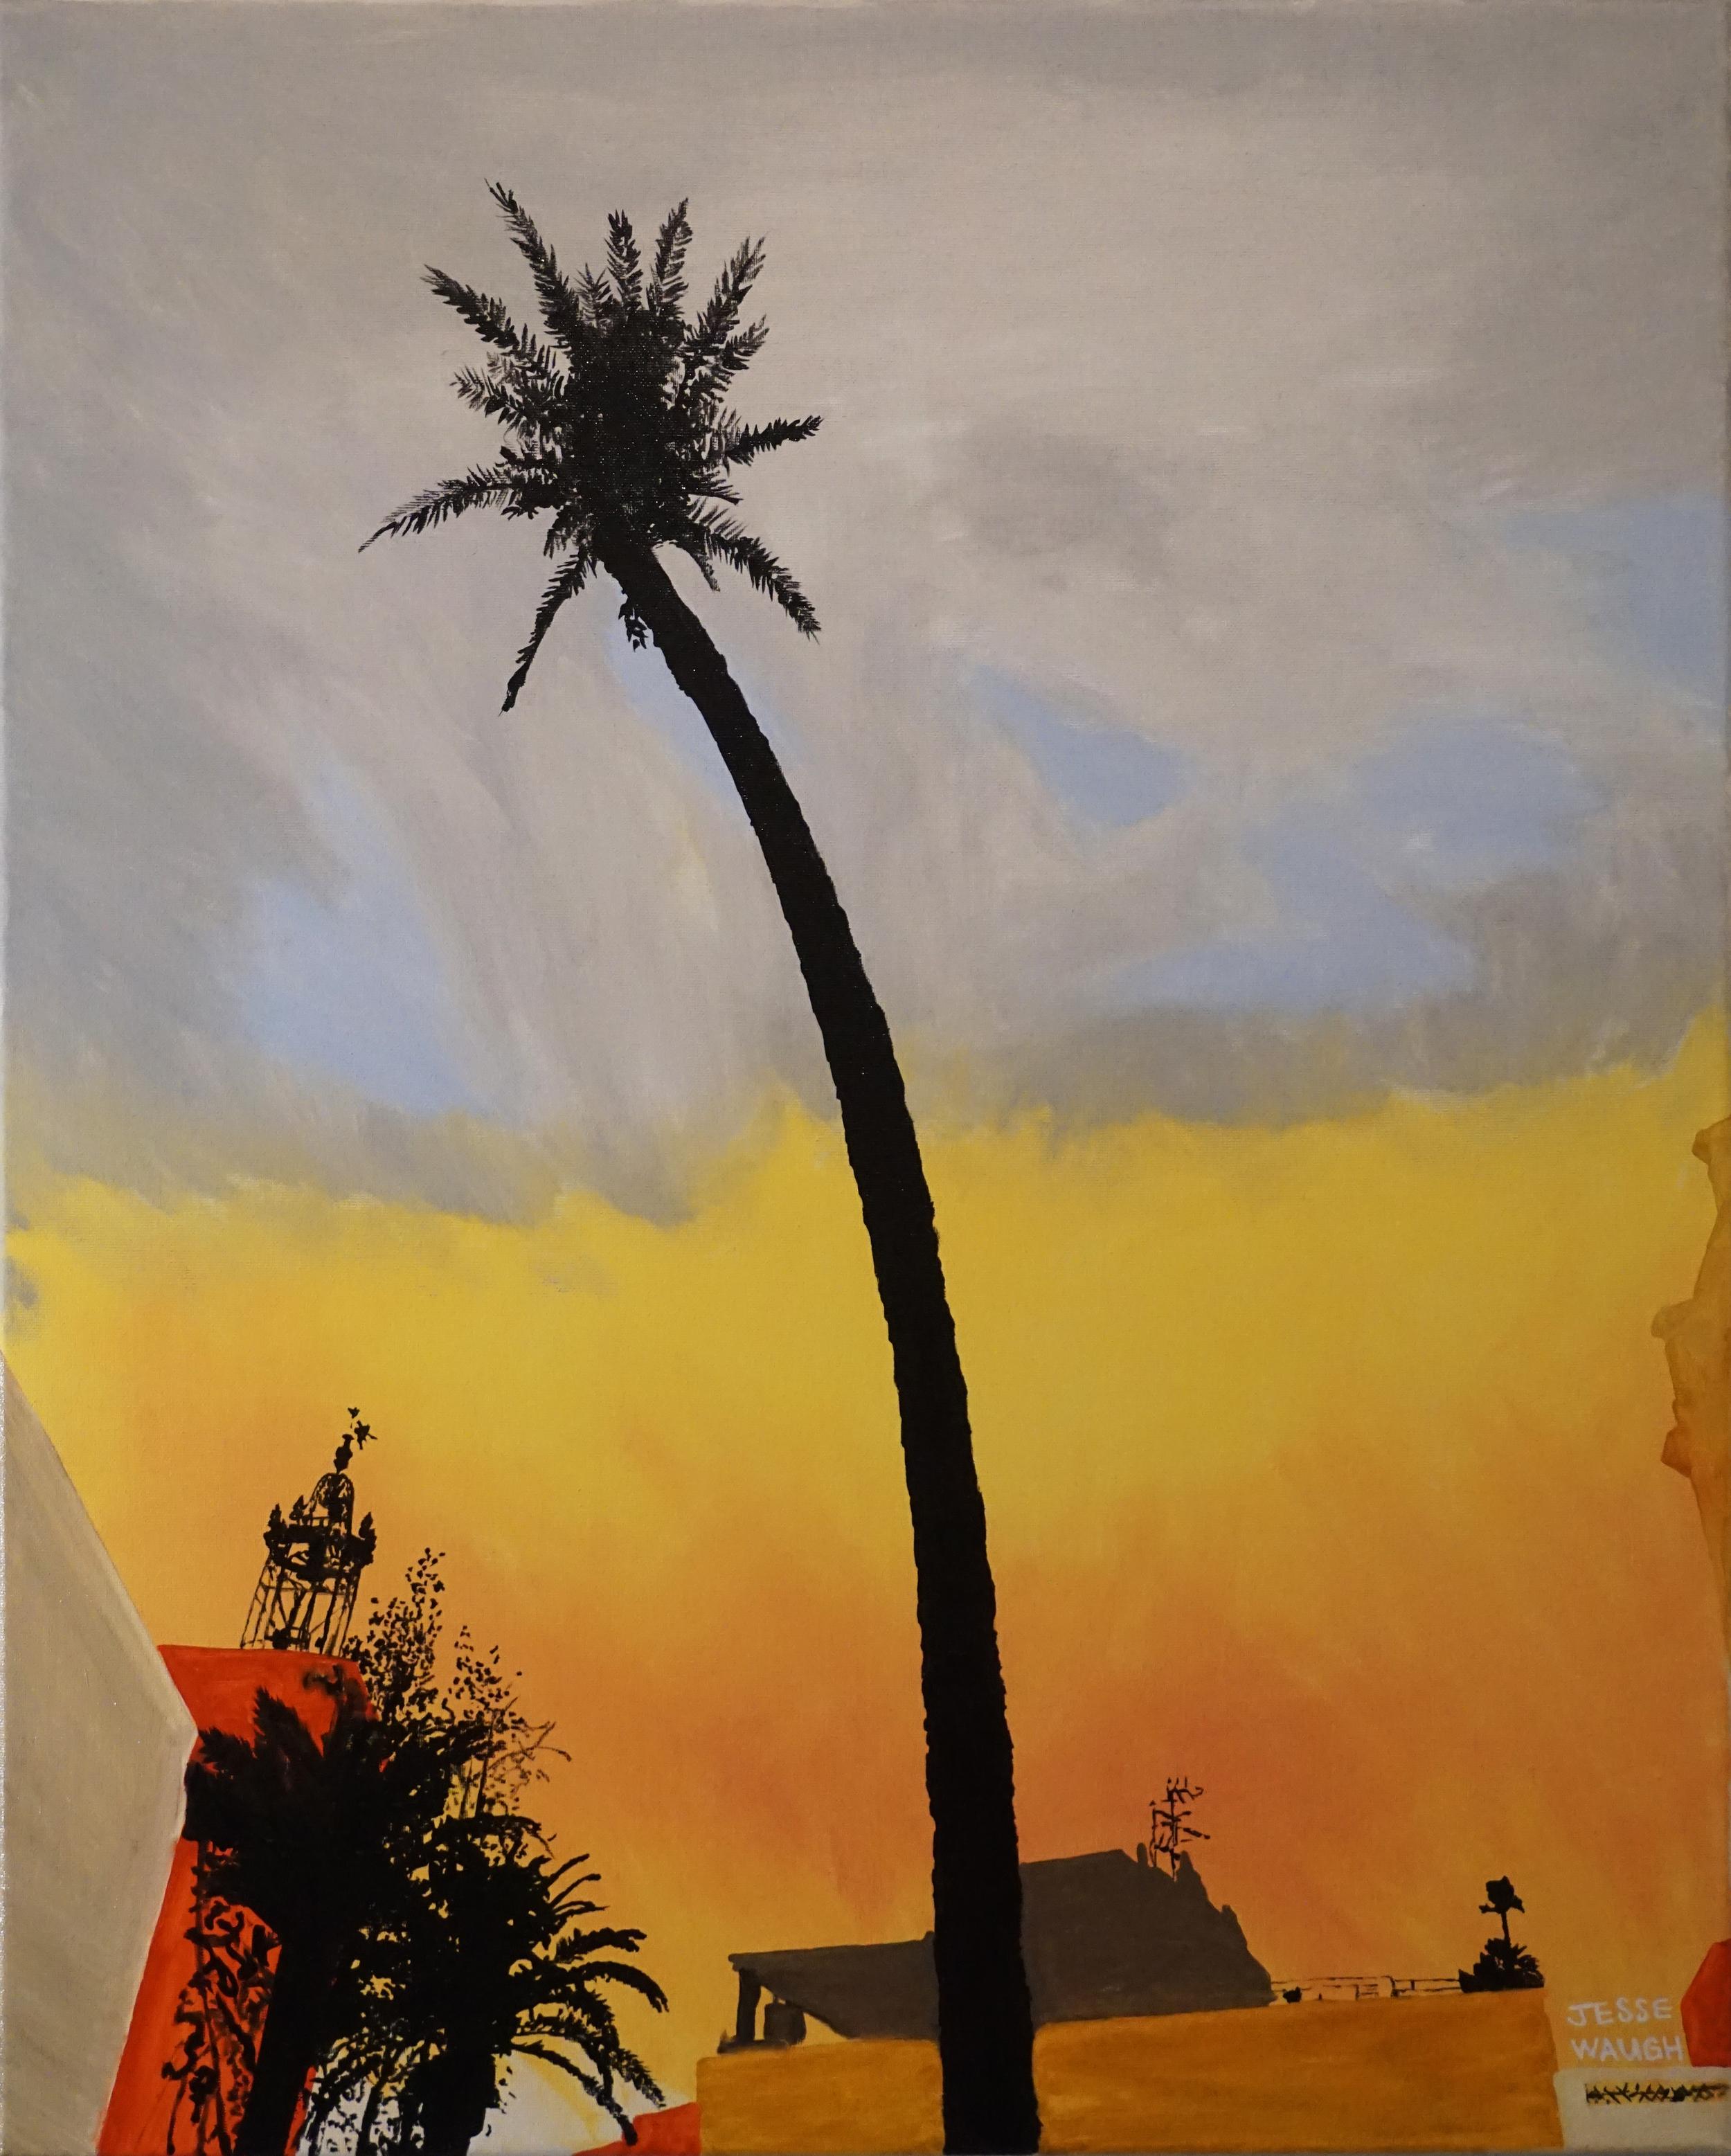 Jesse Waugh   Maricel Palm   2015 Oil on canvas